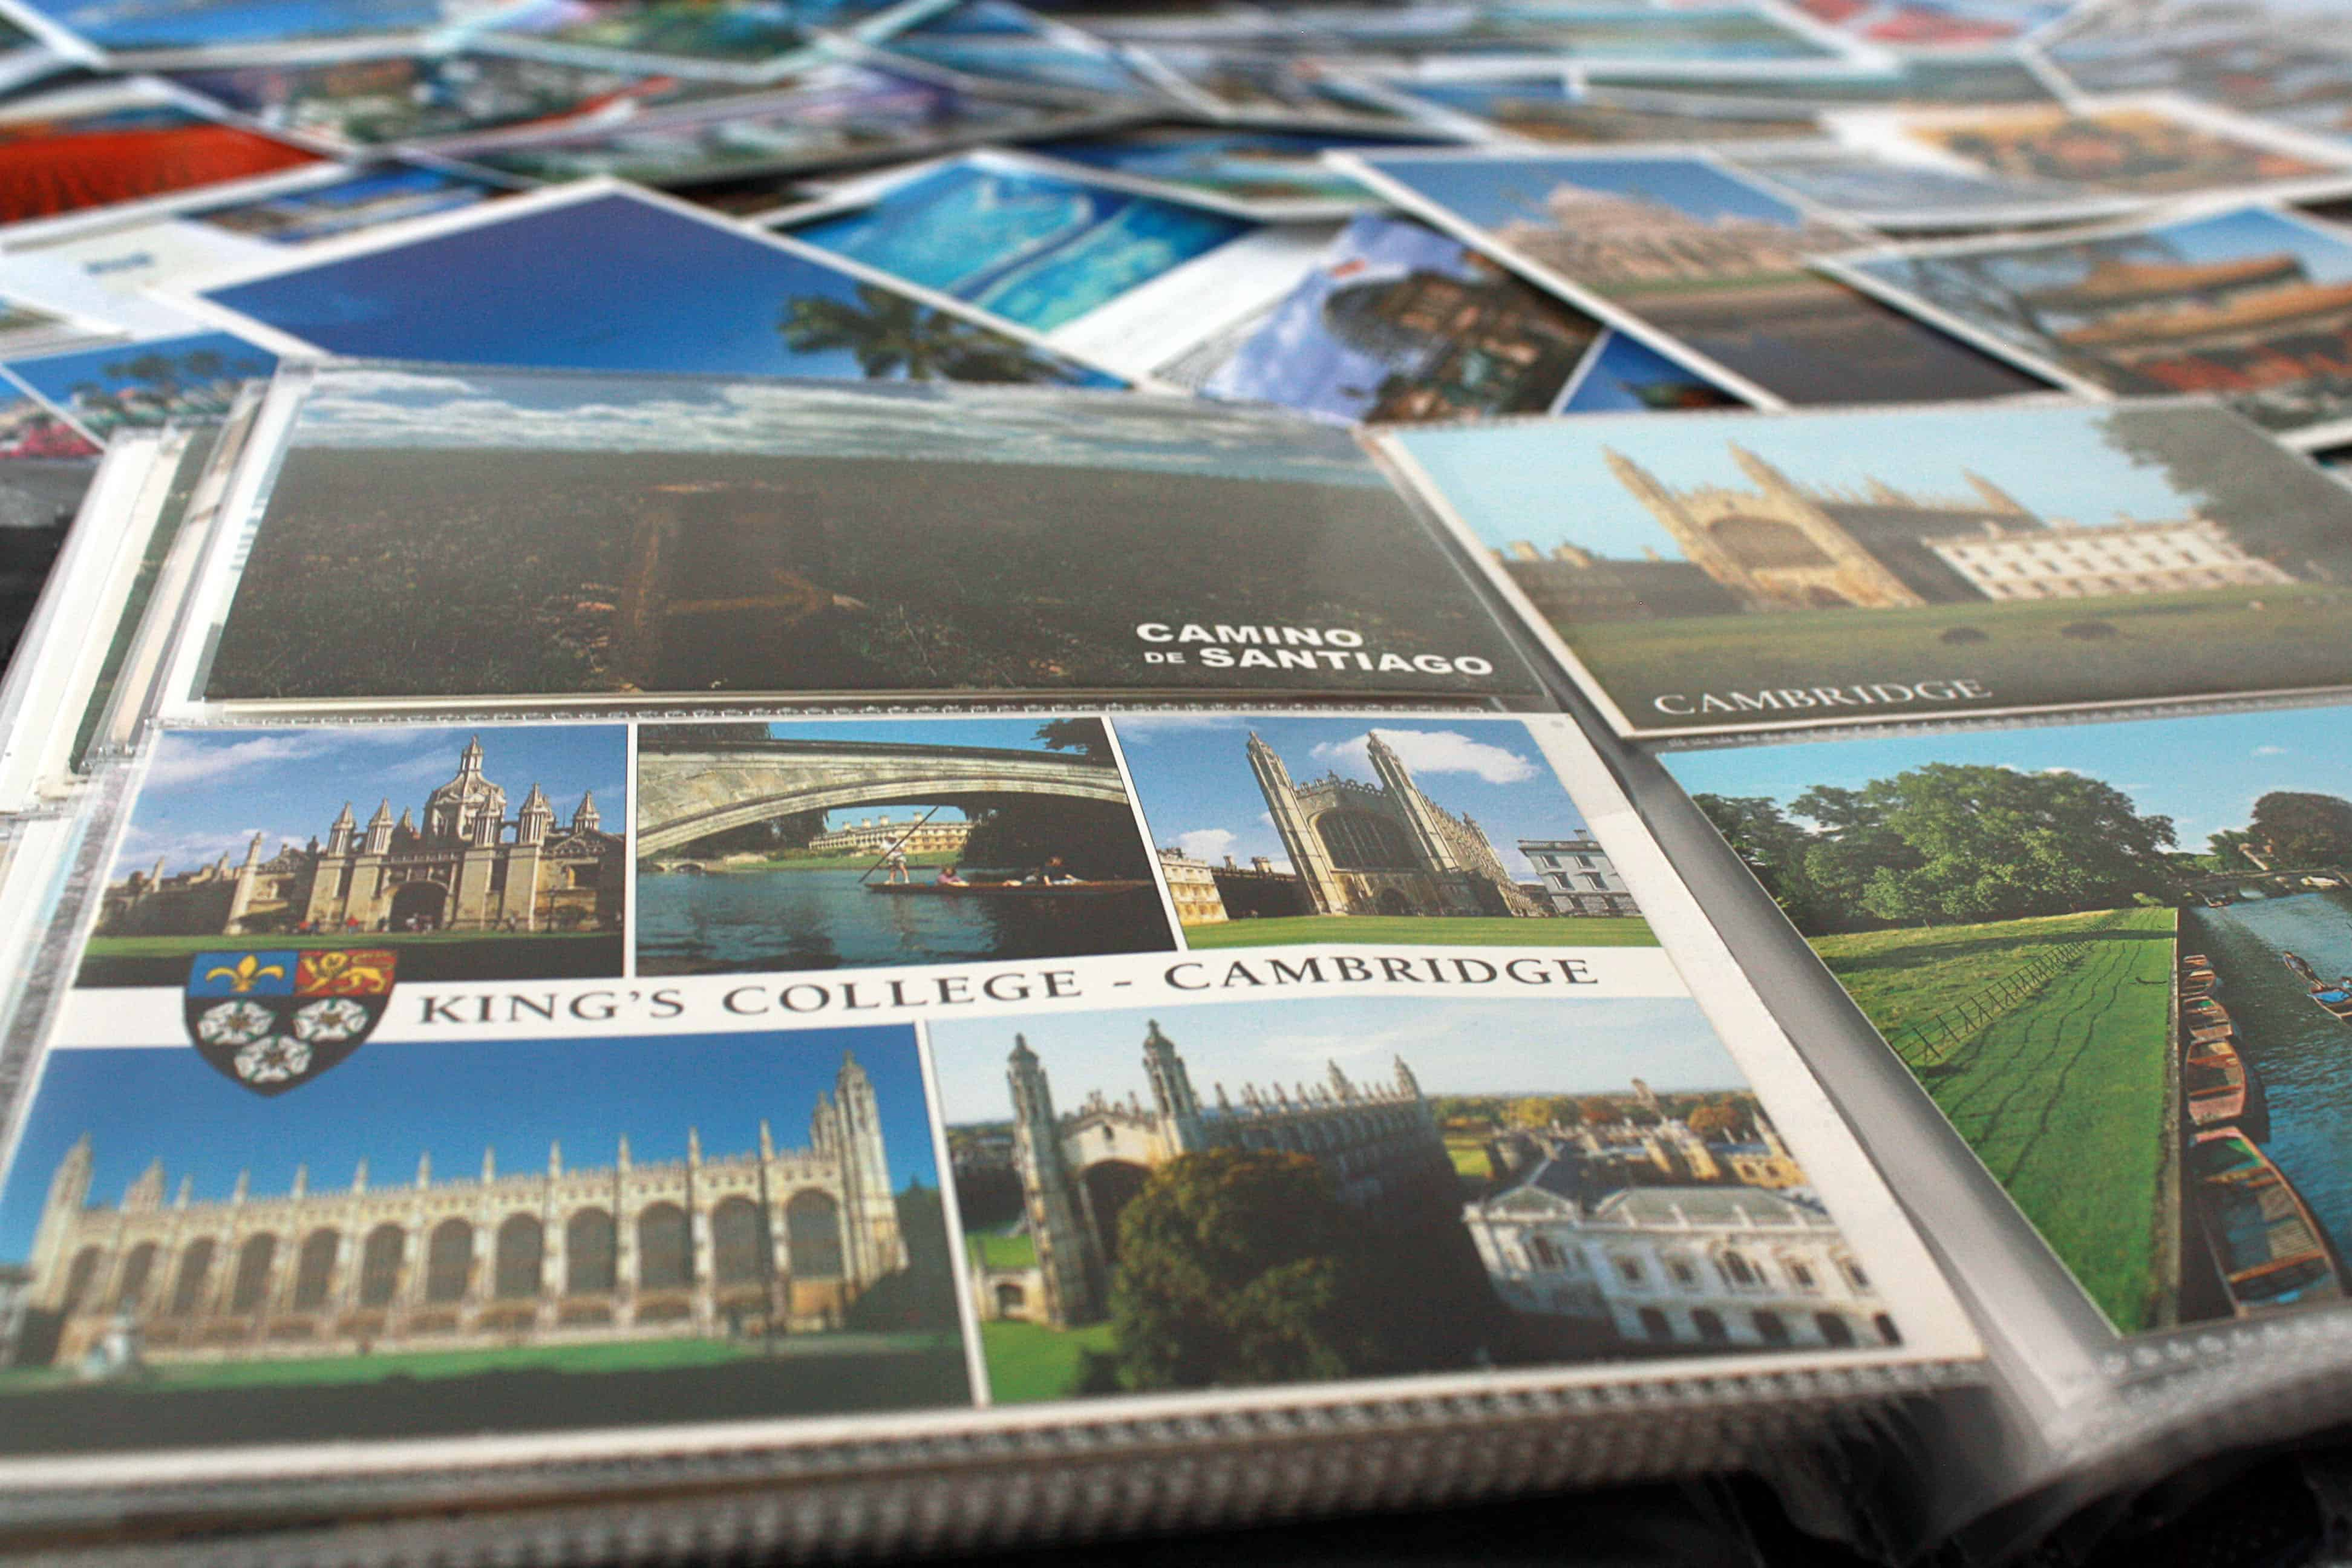 Camino de Santiago and Cambridge postcards and more